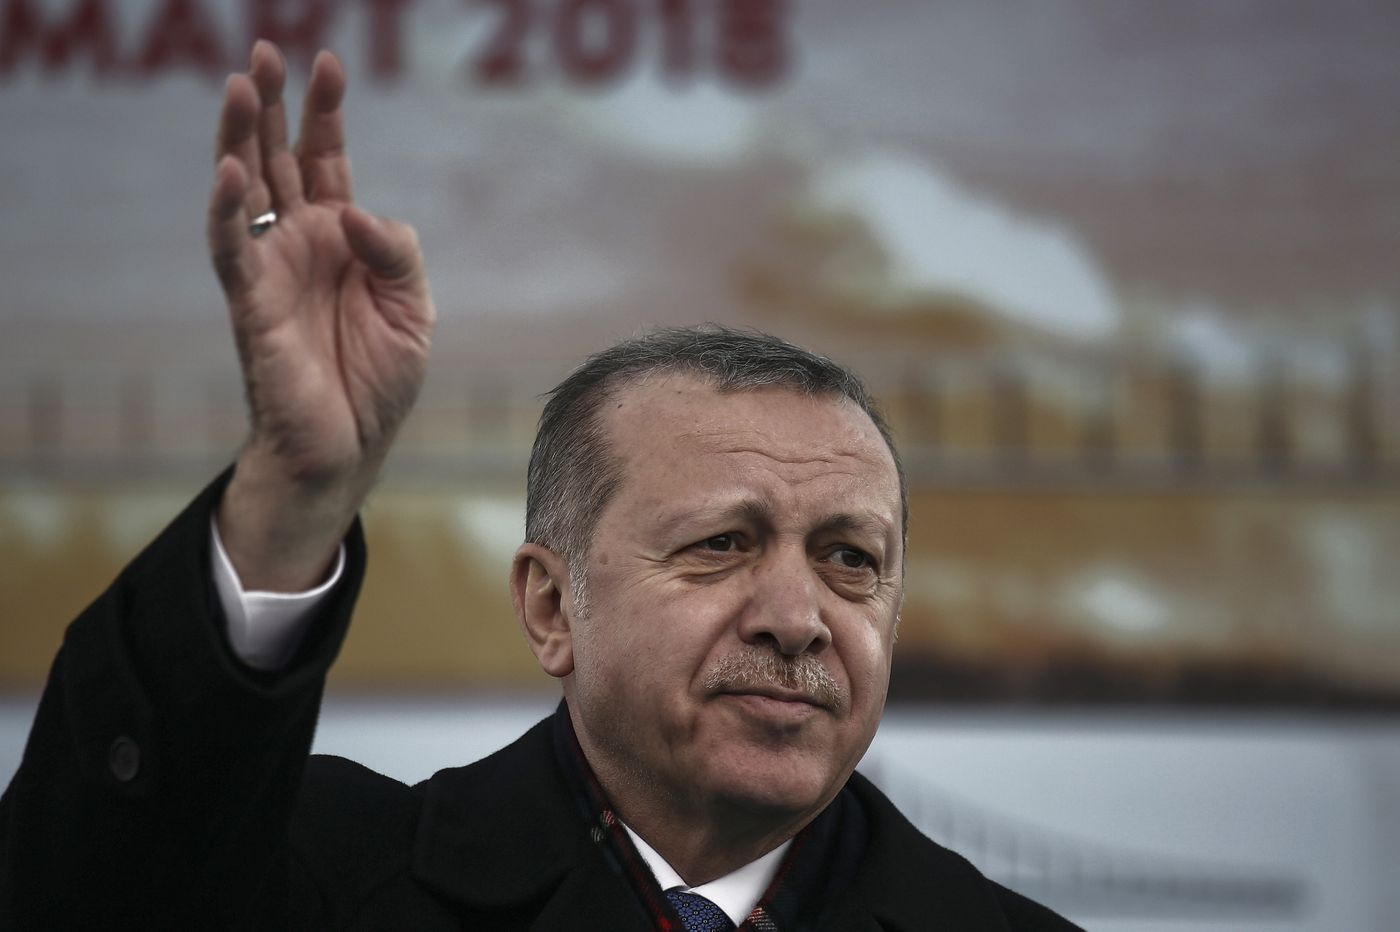 Turkish president says Jamal Khashoggi's killing was a planned operation